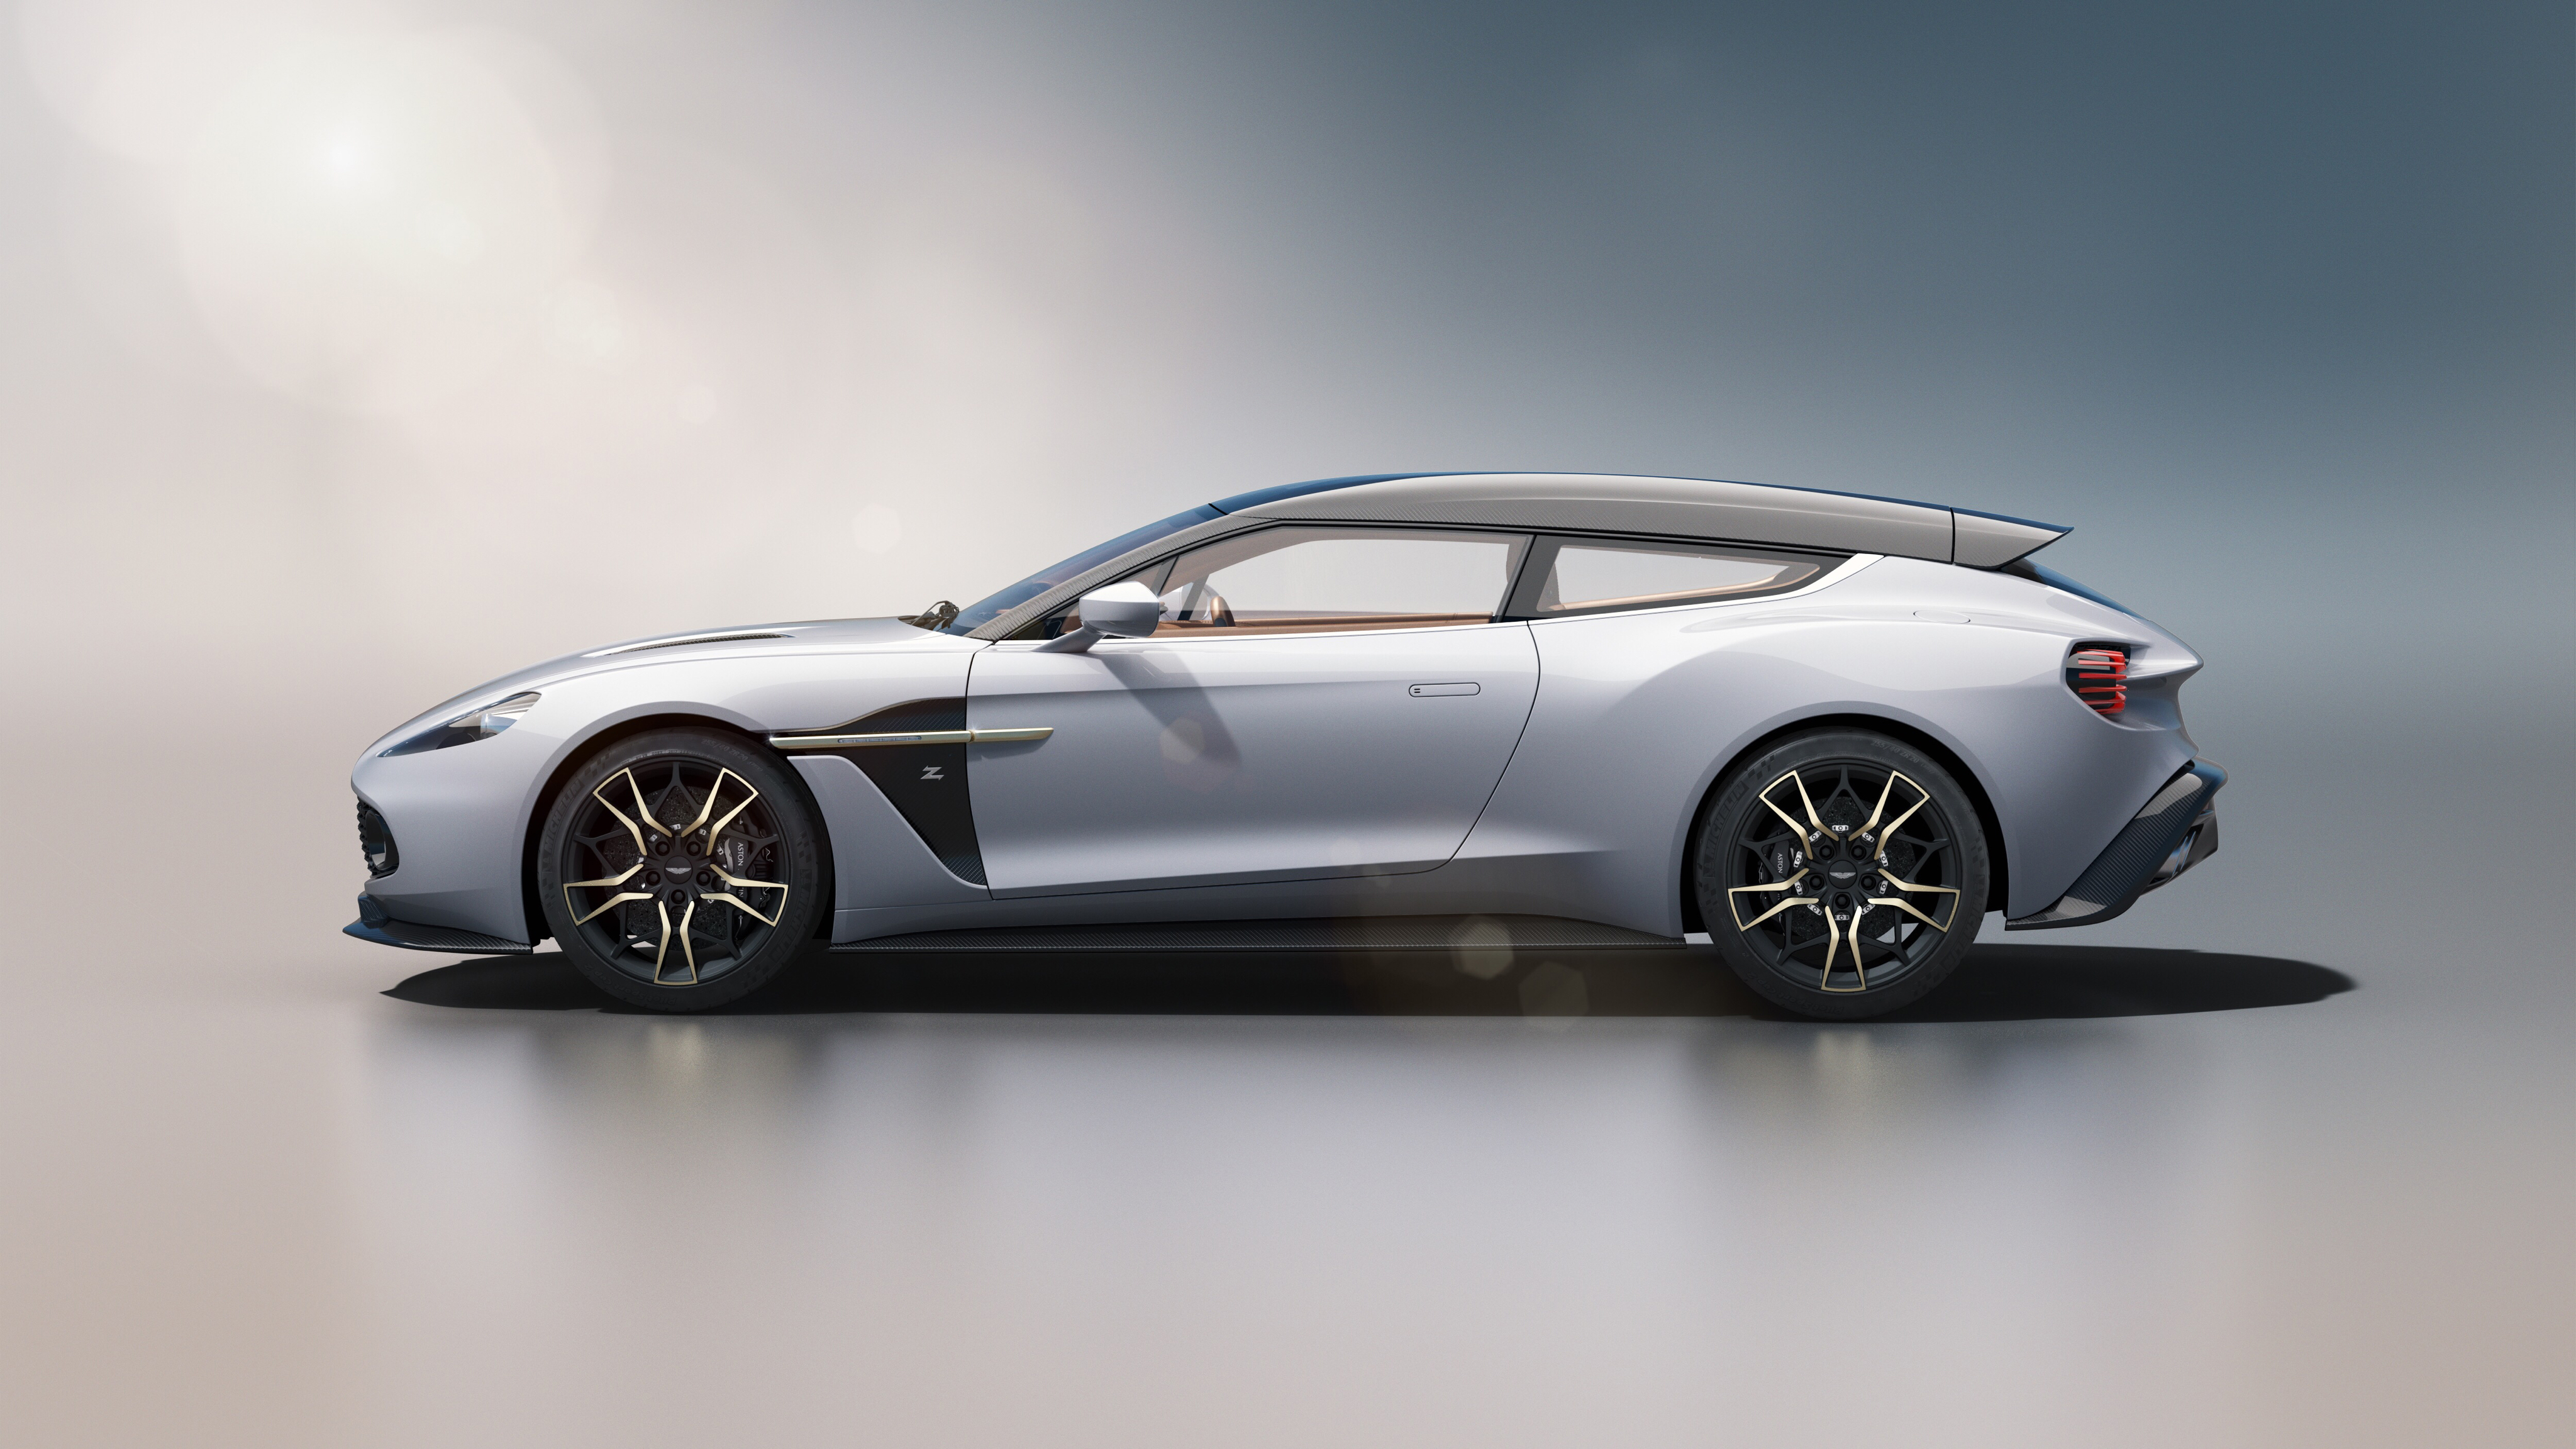 Aston Martin Vanquish Zagato Shooting Brake 2019 4k Wallpaper Hd Car Wallpapers Id 11674